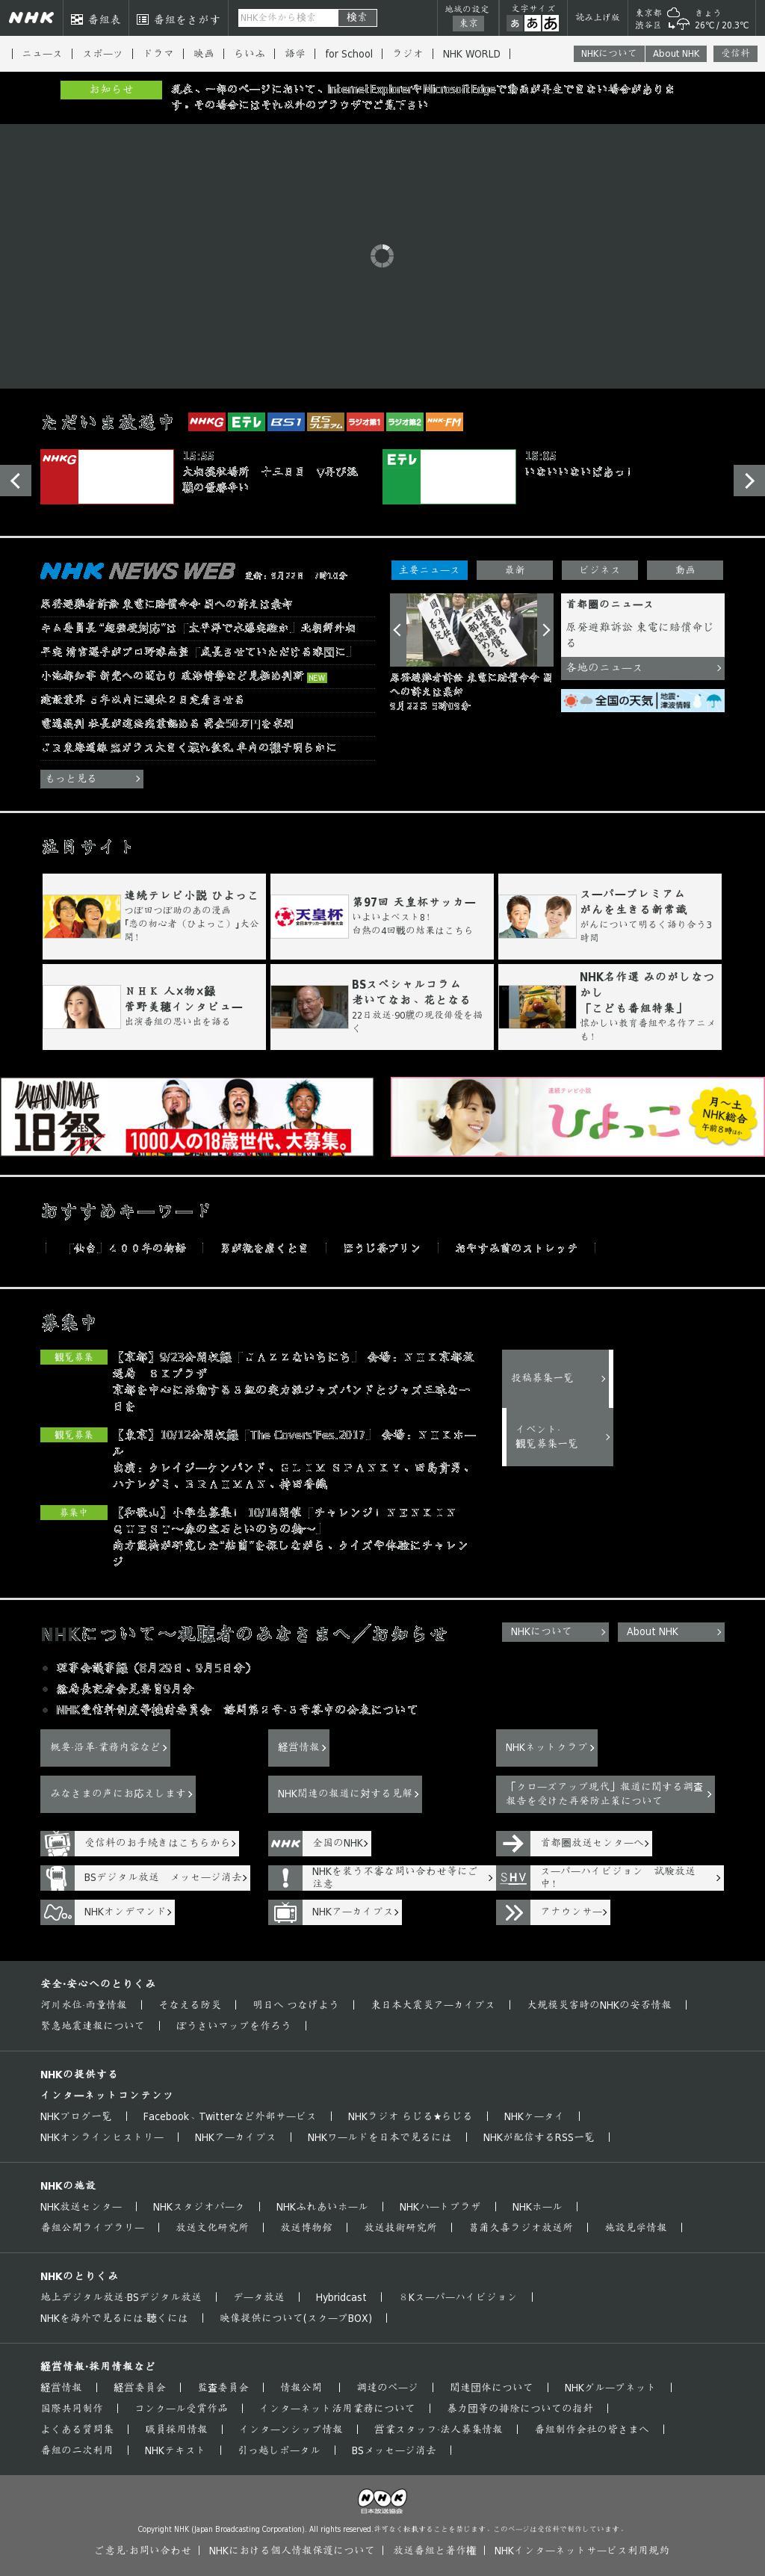 NHK Online at Friday Sept. 22, 2017, 7:12 a.m. UTC